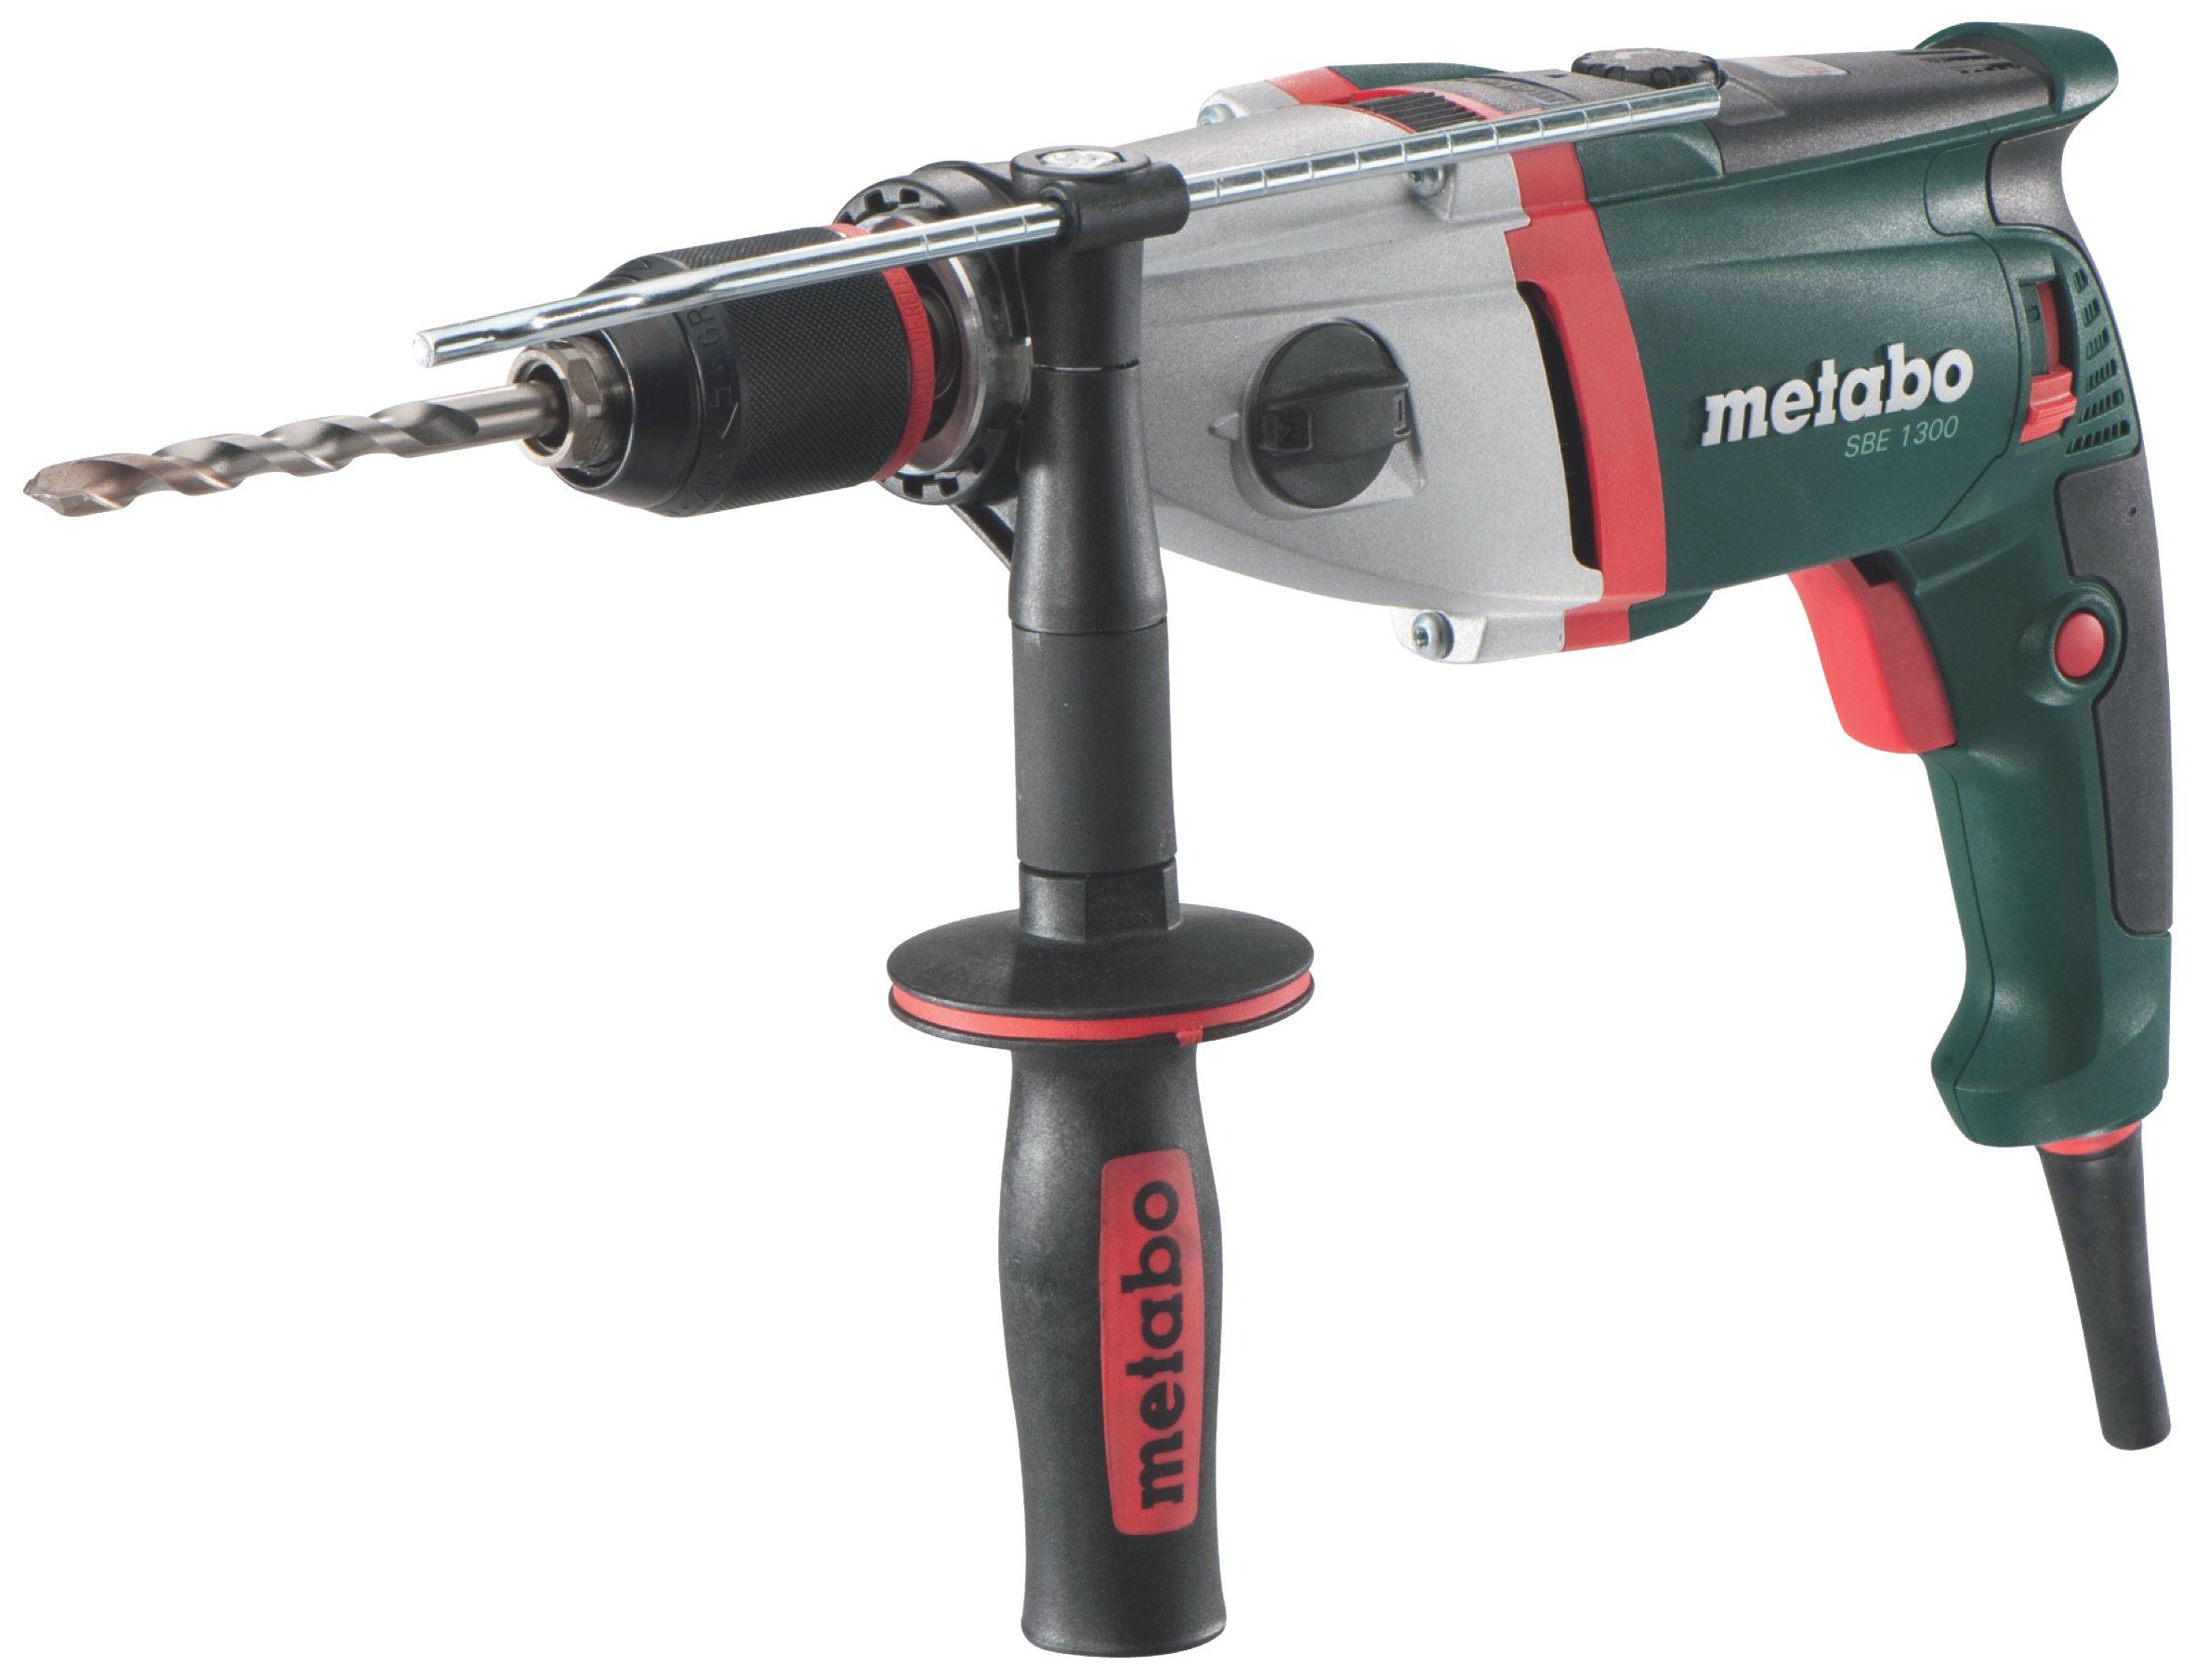 Metabo-600843500-SBE-1300-Schlagbohrmaschine-TV00